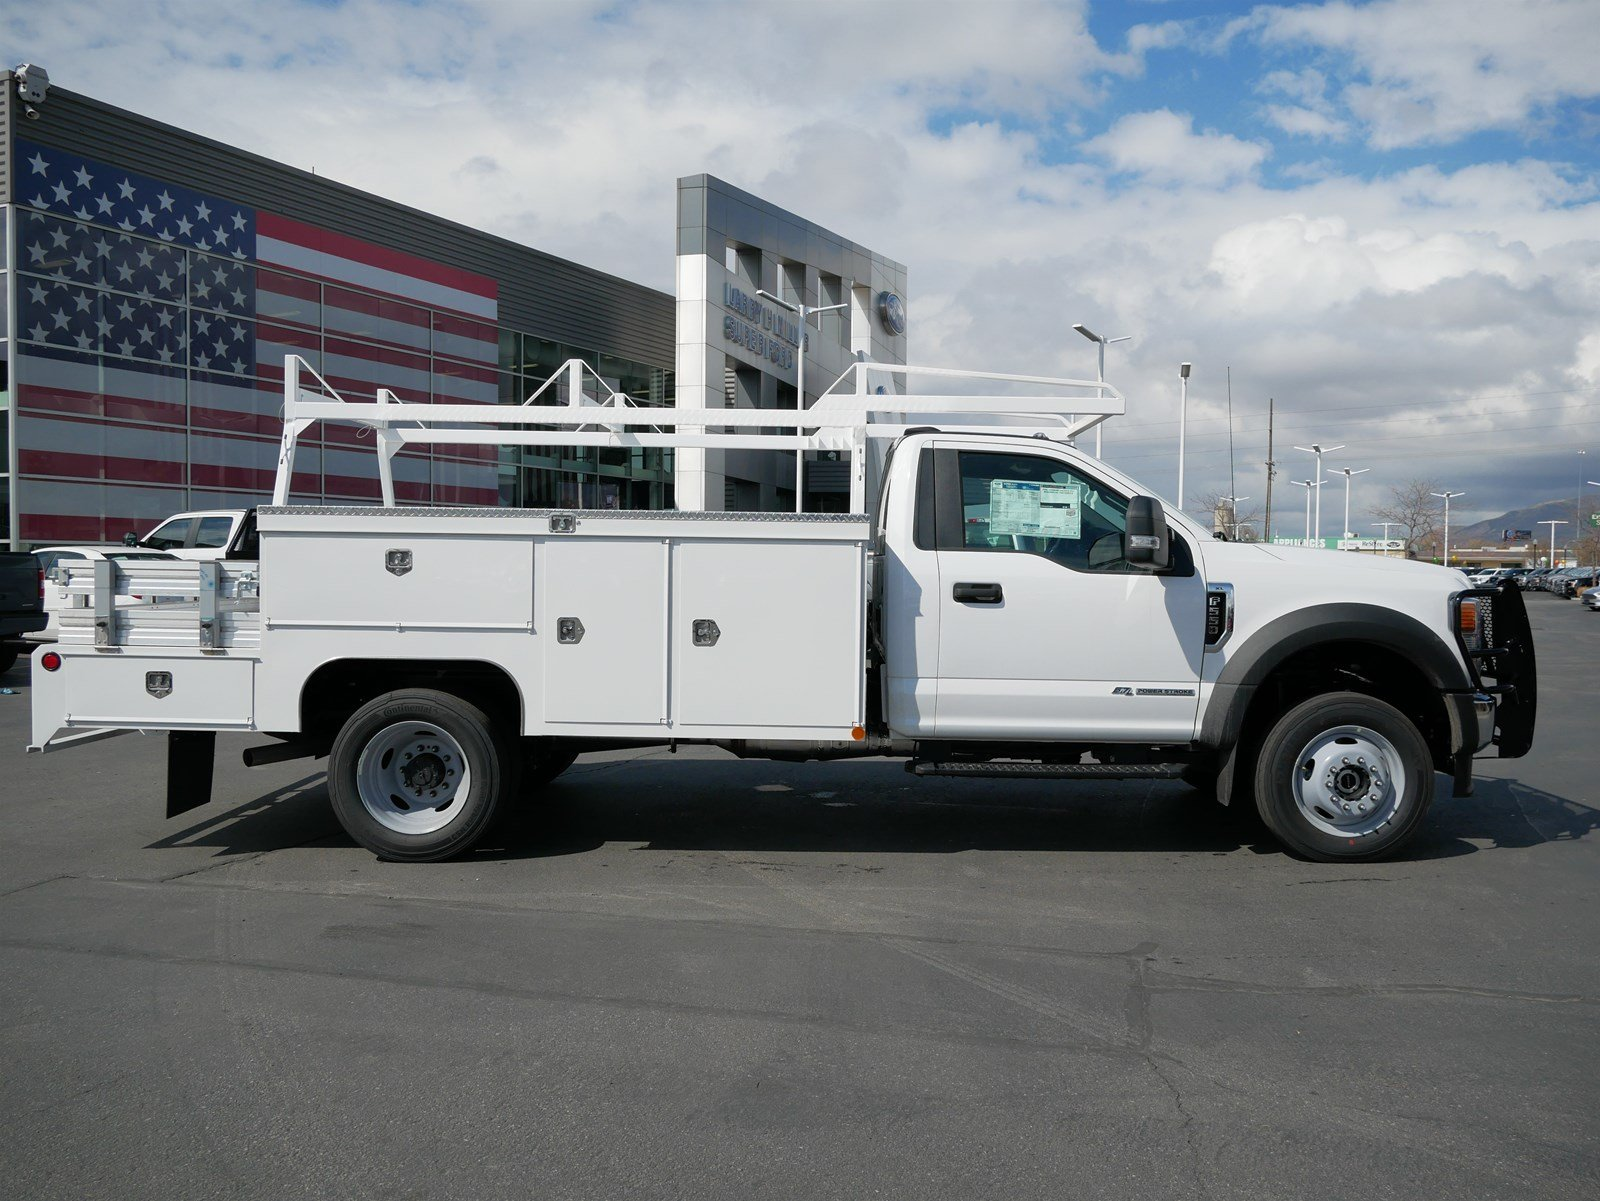 2020 F-550 Regular Cab DRW 4x4, Scelzi SEC Combo Body #63081 - photo 3